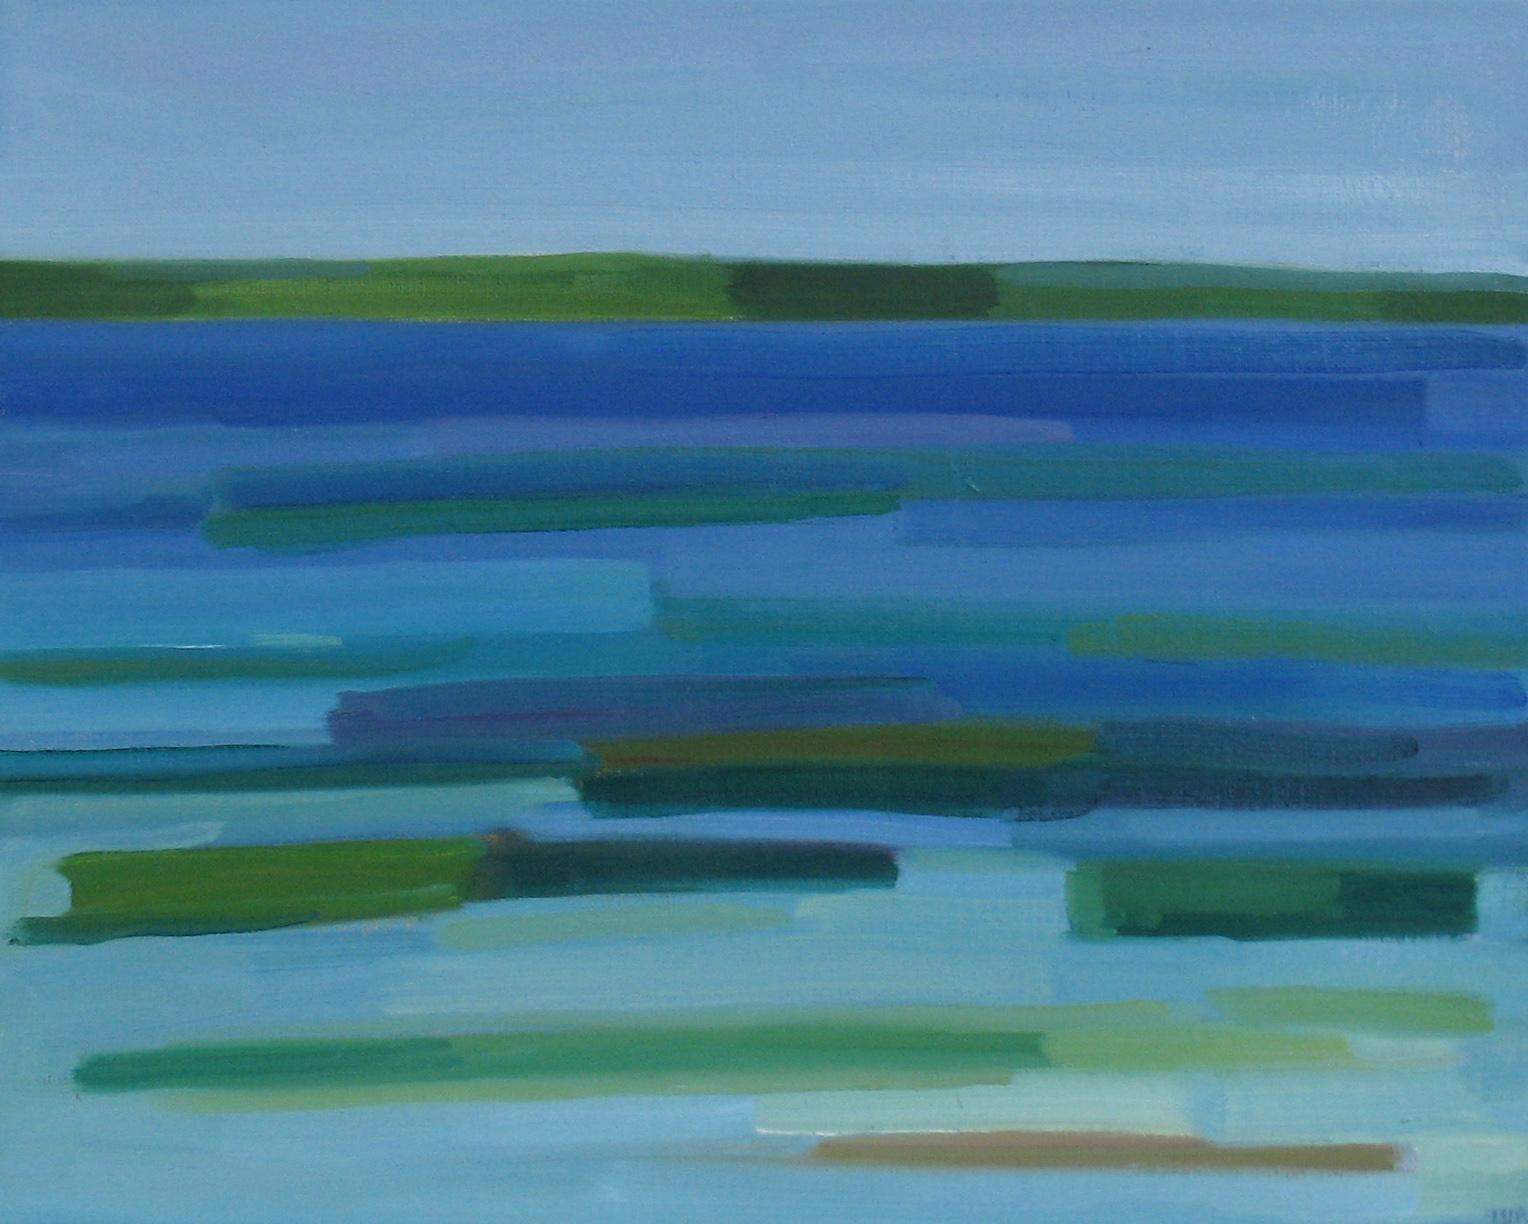 2017, Rasmussen, La mer, 48x60 cm, huile sur toile